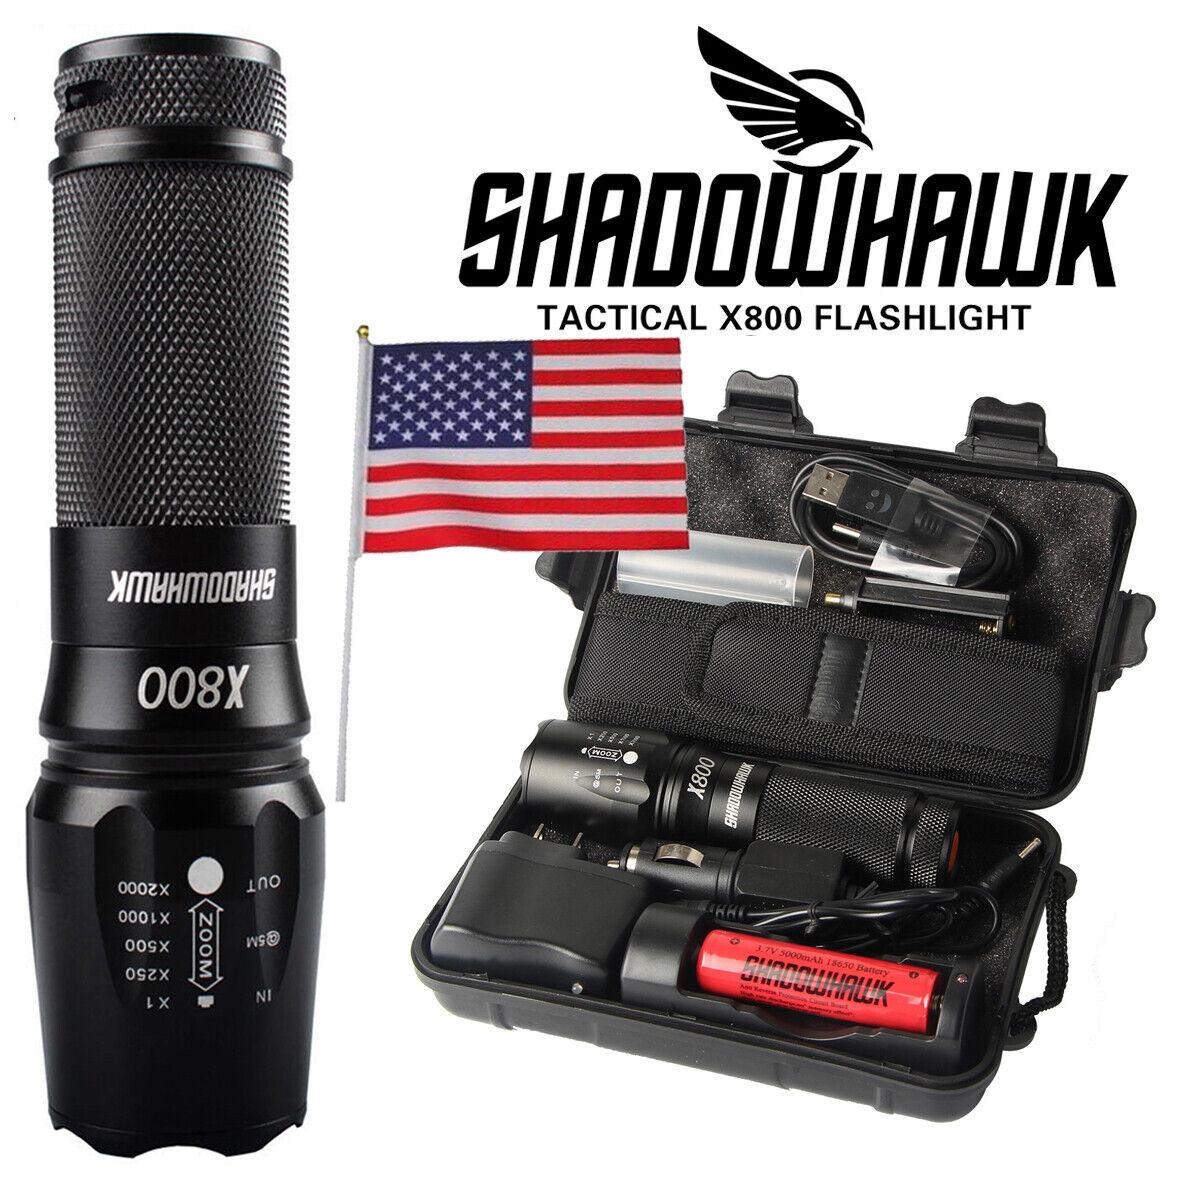 100000LM X800 LED Tactical*Military L2 LED Flashlight Torch Light Lamp Gift Kit